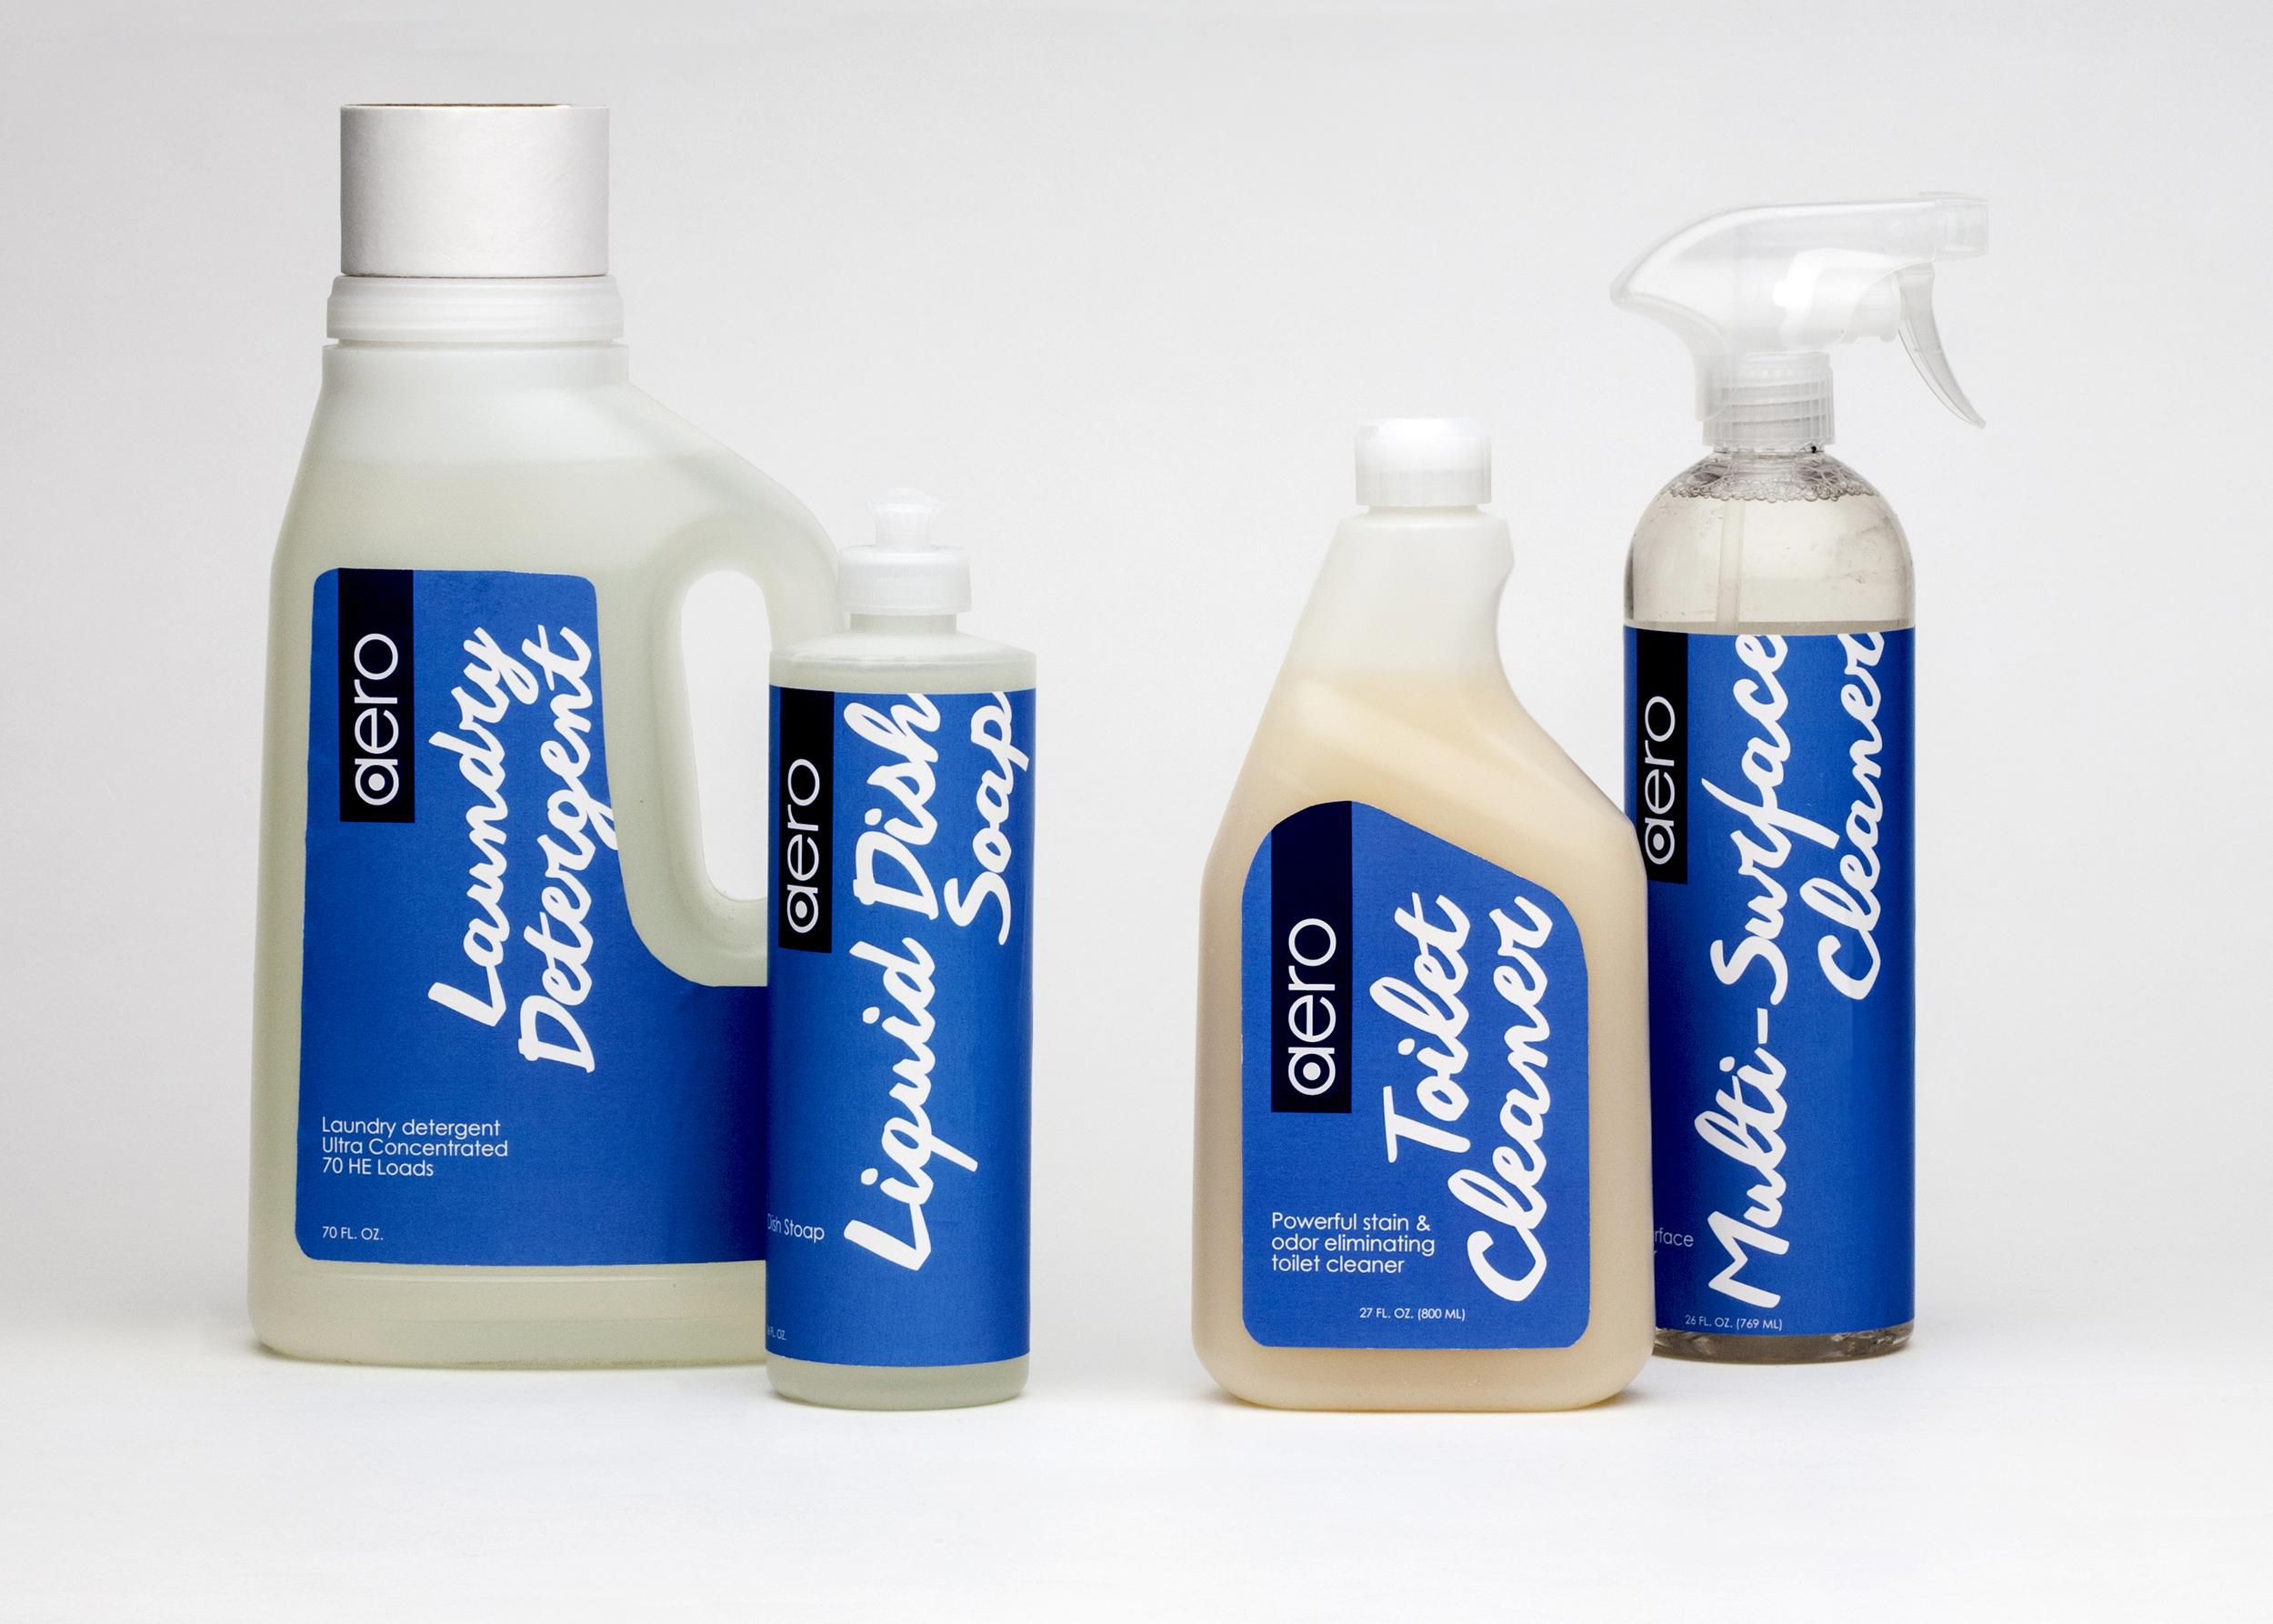 Aero product line